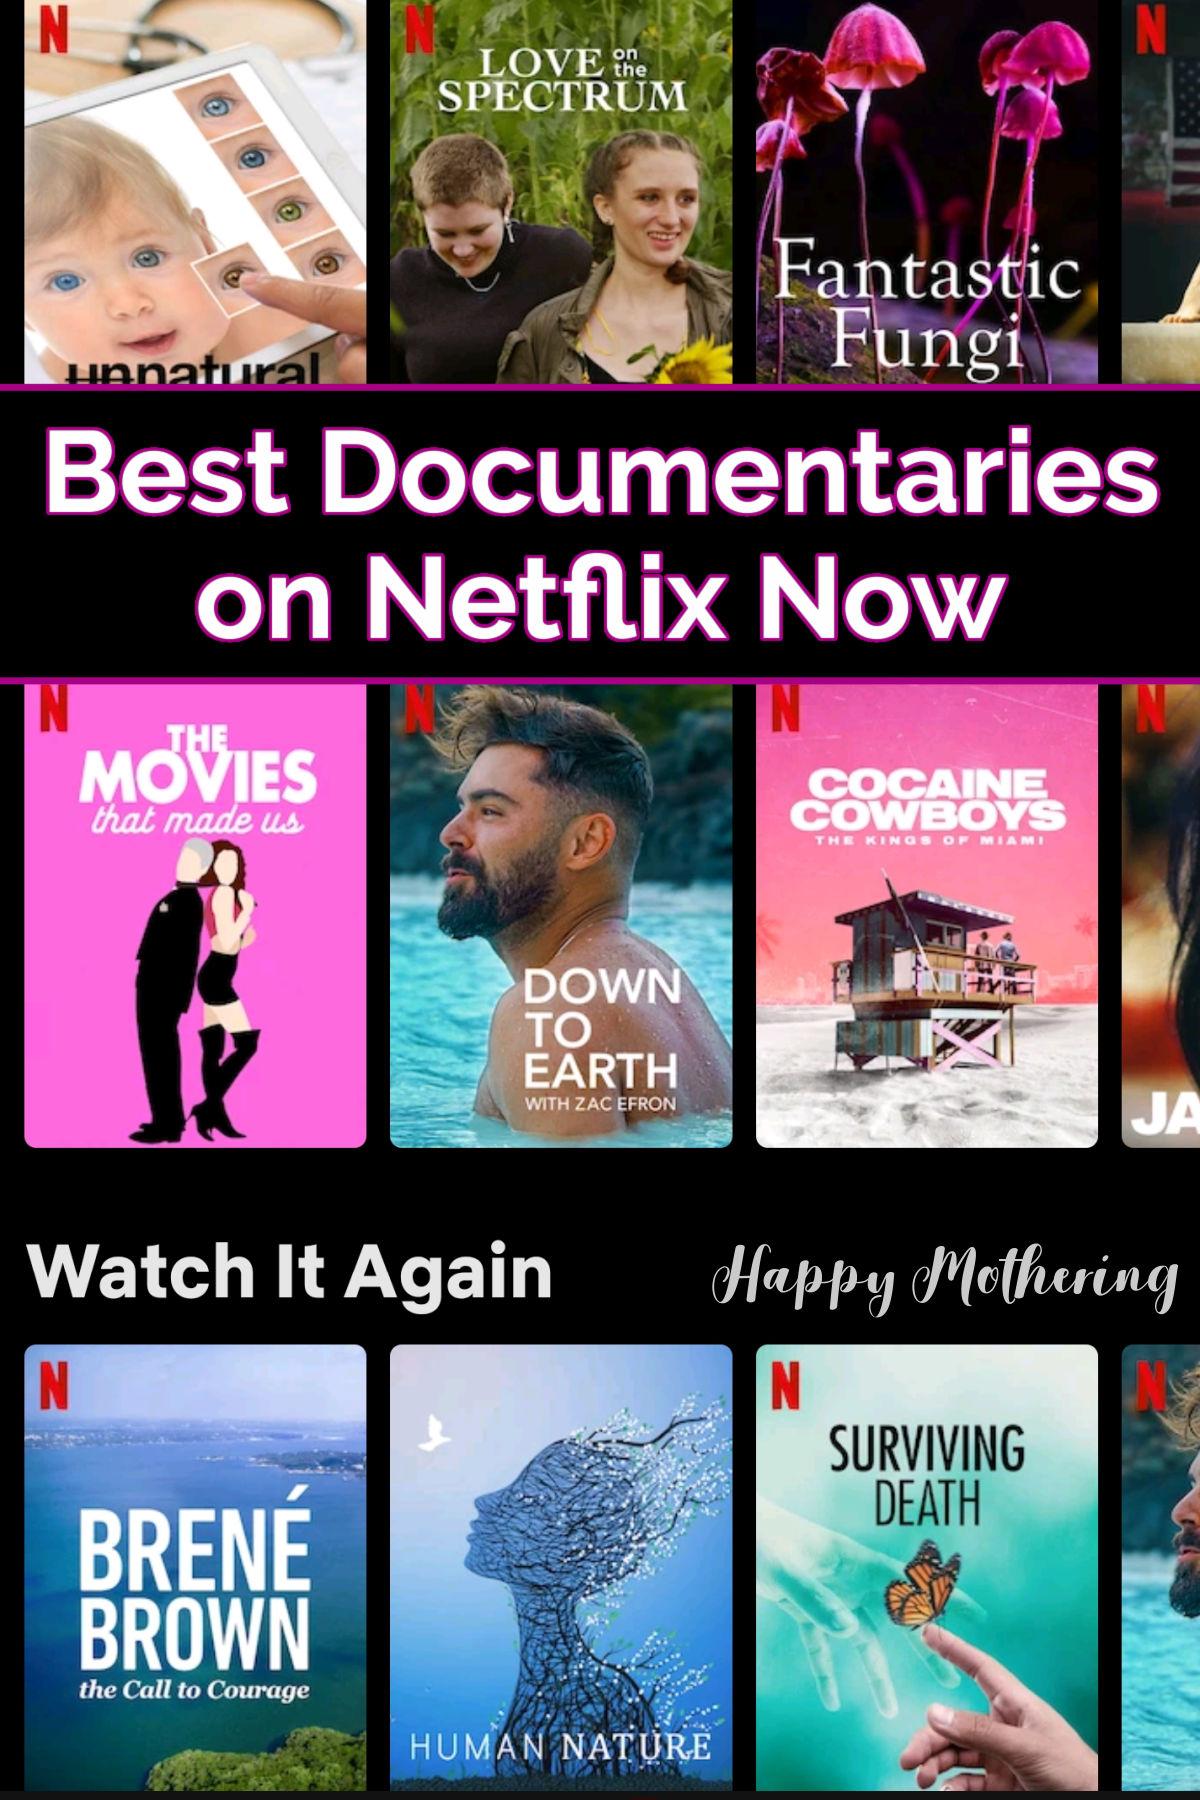 Screenshot of documentaries on Netflix now from app.